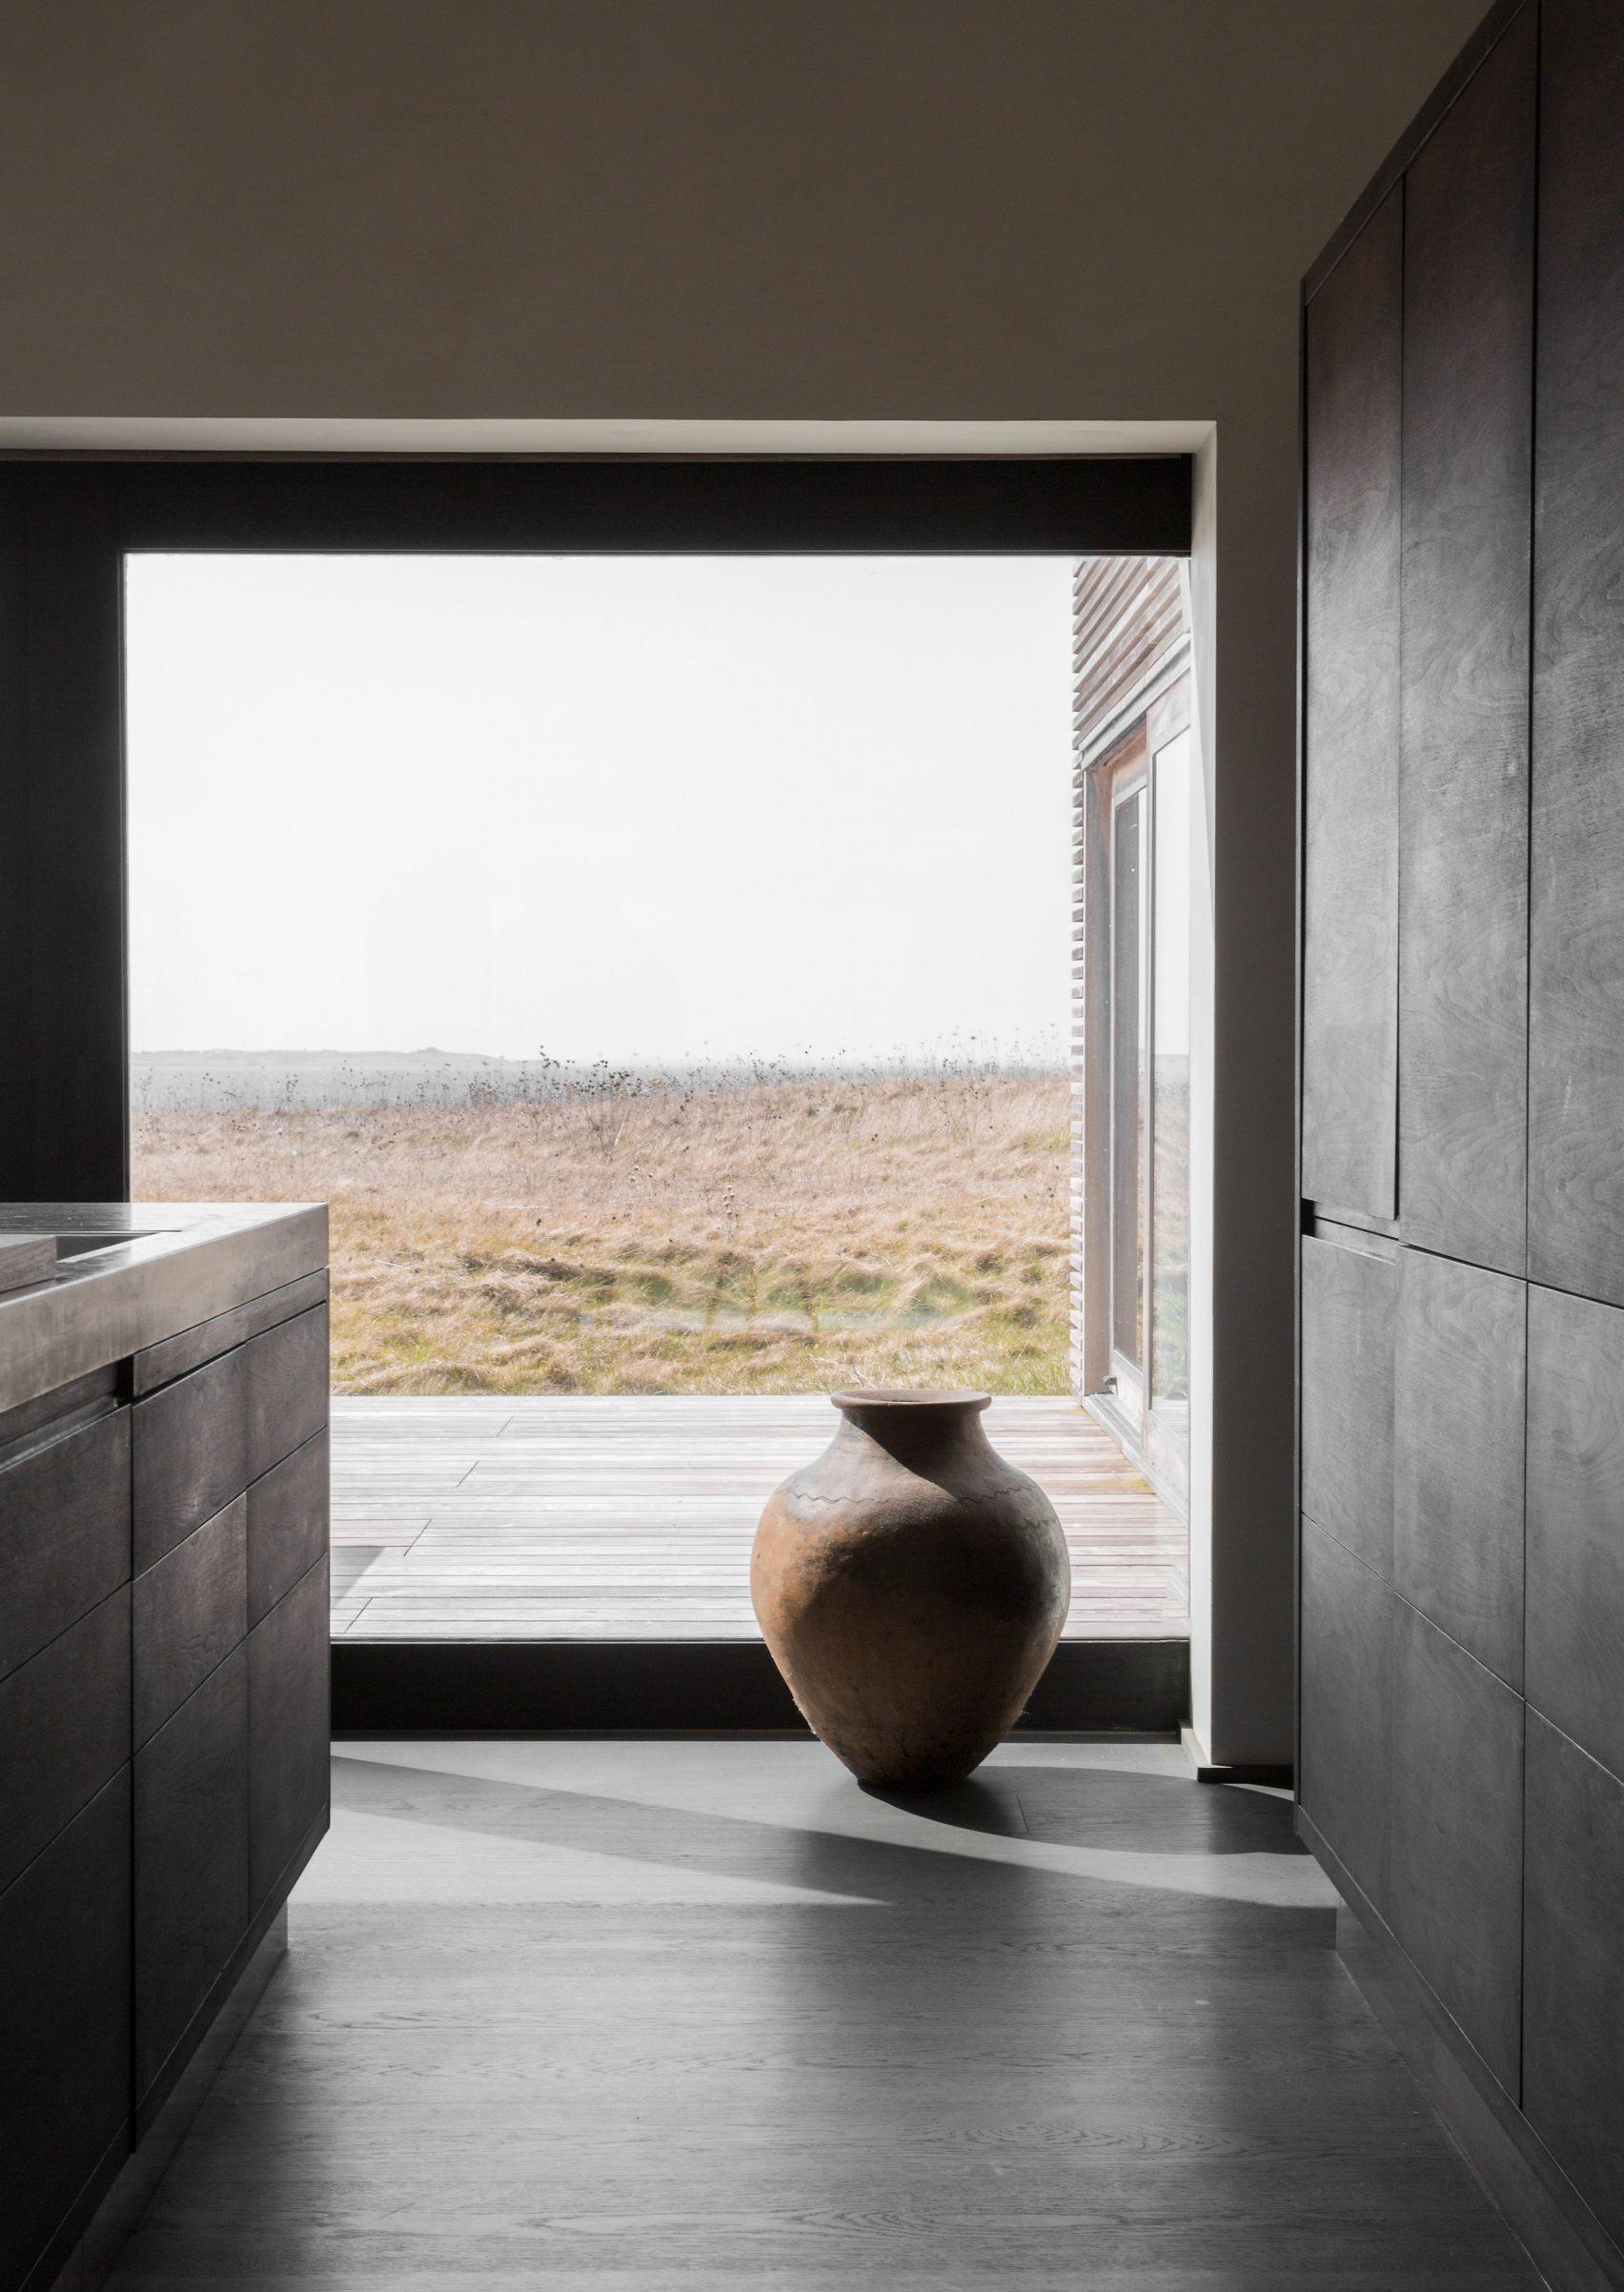 seaside-abode-norm-architects-denmark-aprilandmay-3.jpg